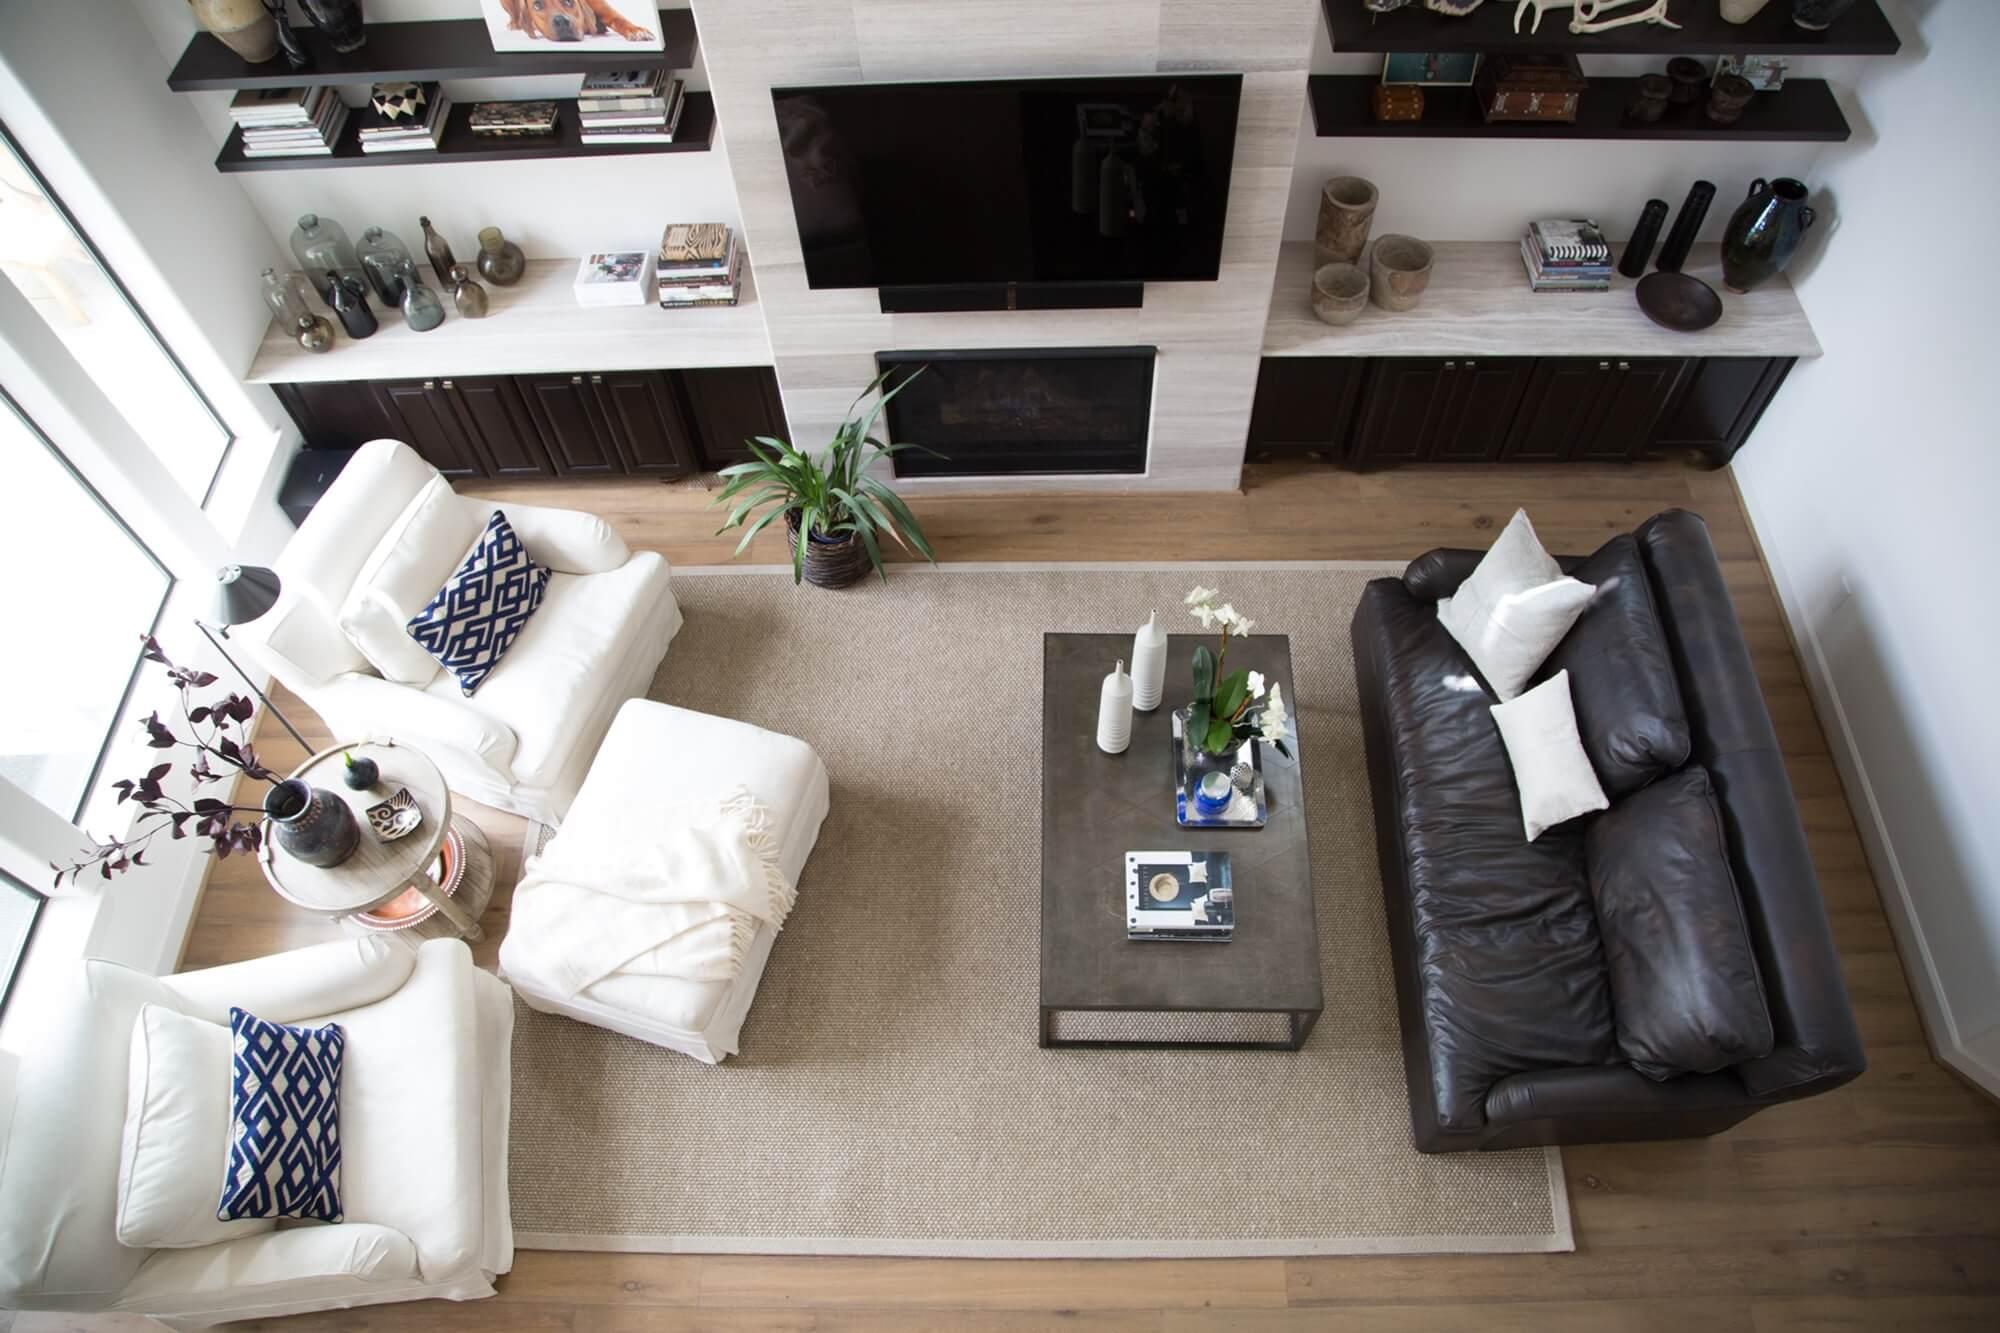 Remodel - new flooring, fireplace, floating shelves